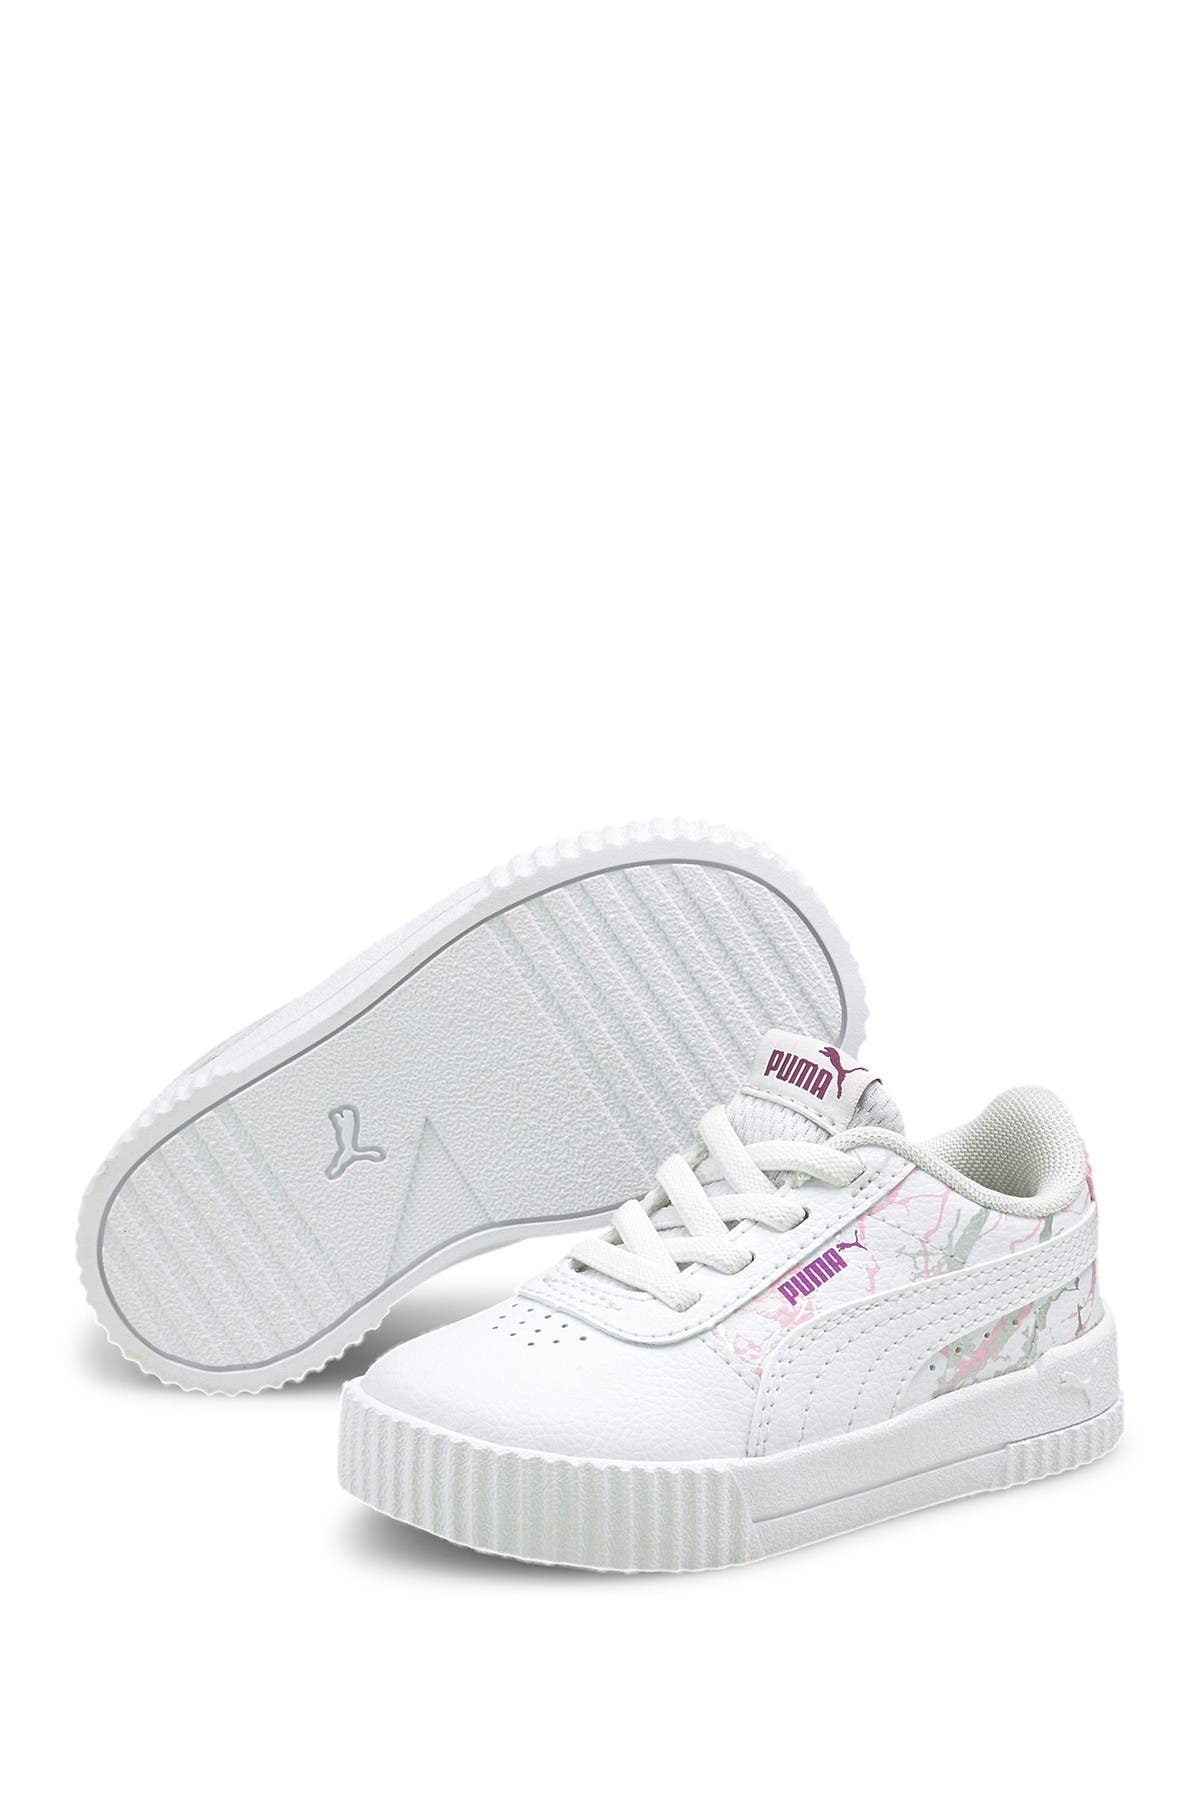 Image of PUMA Carina Marble Glitter Sneaker